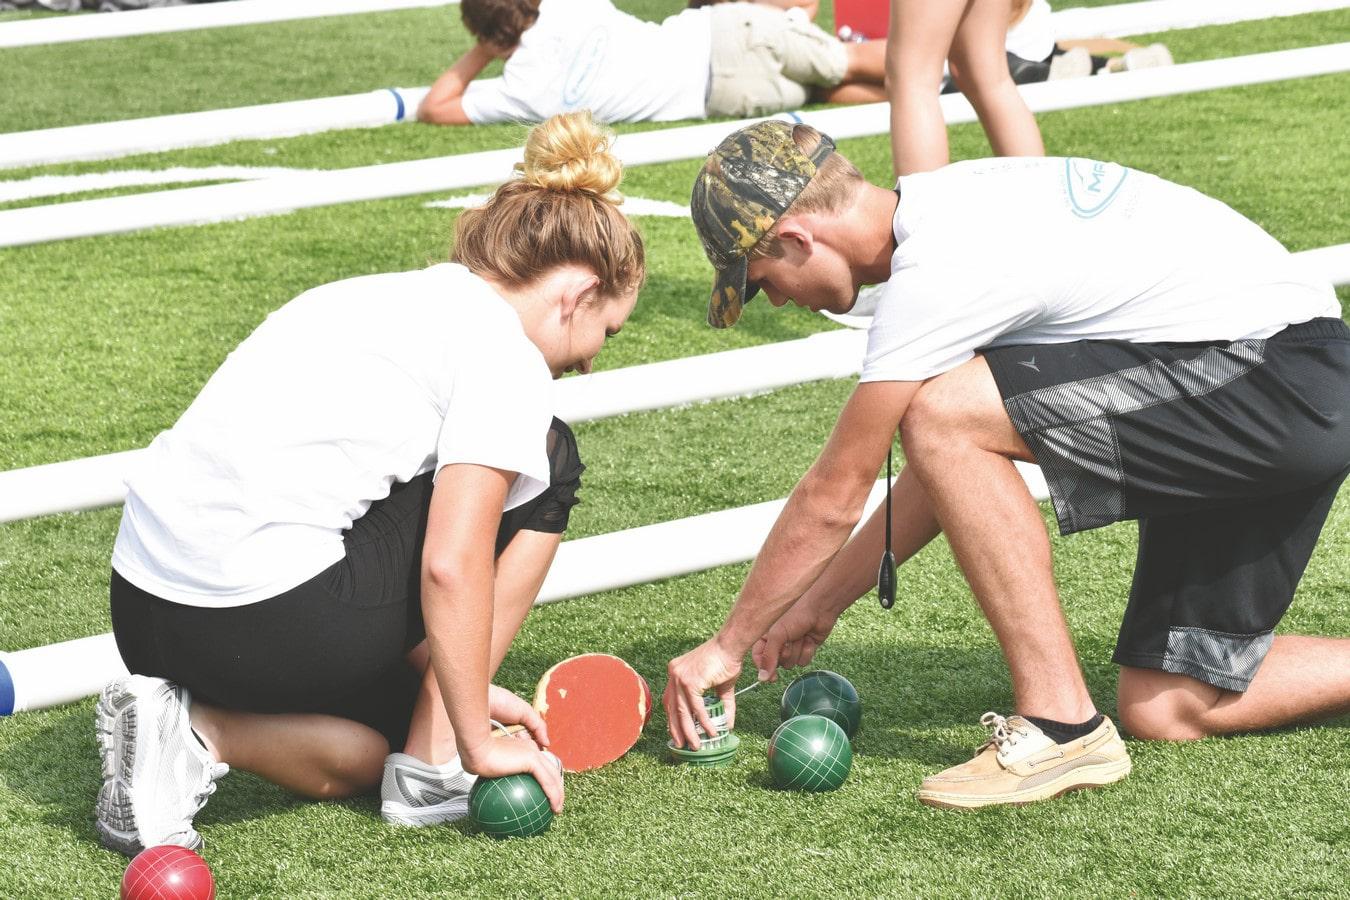 Two volunteers kneel down to measure distance of bocce balls